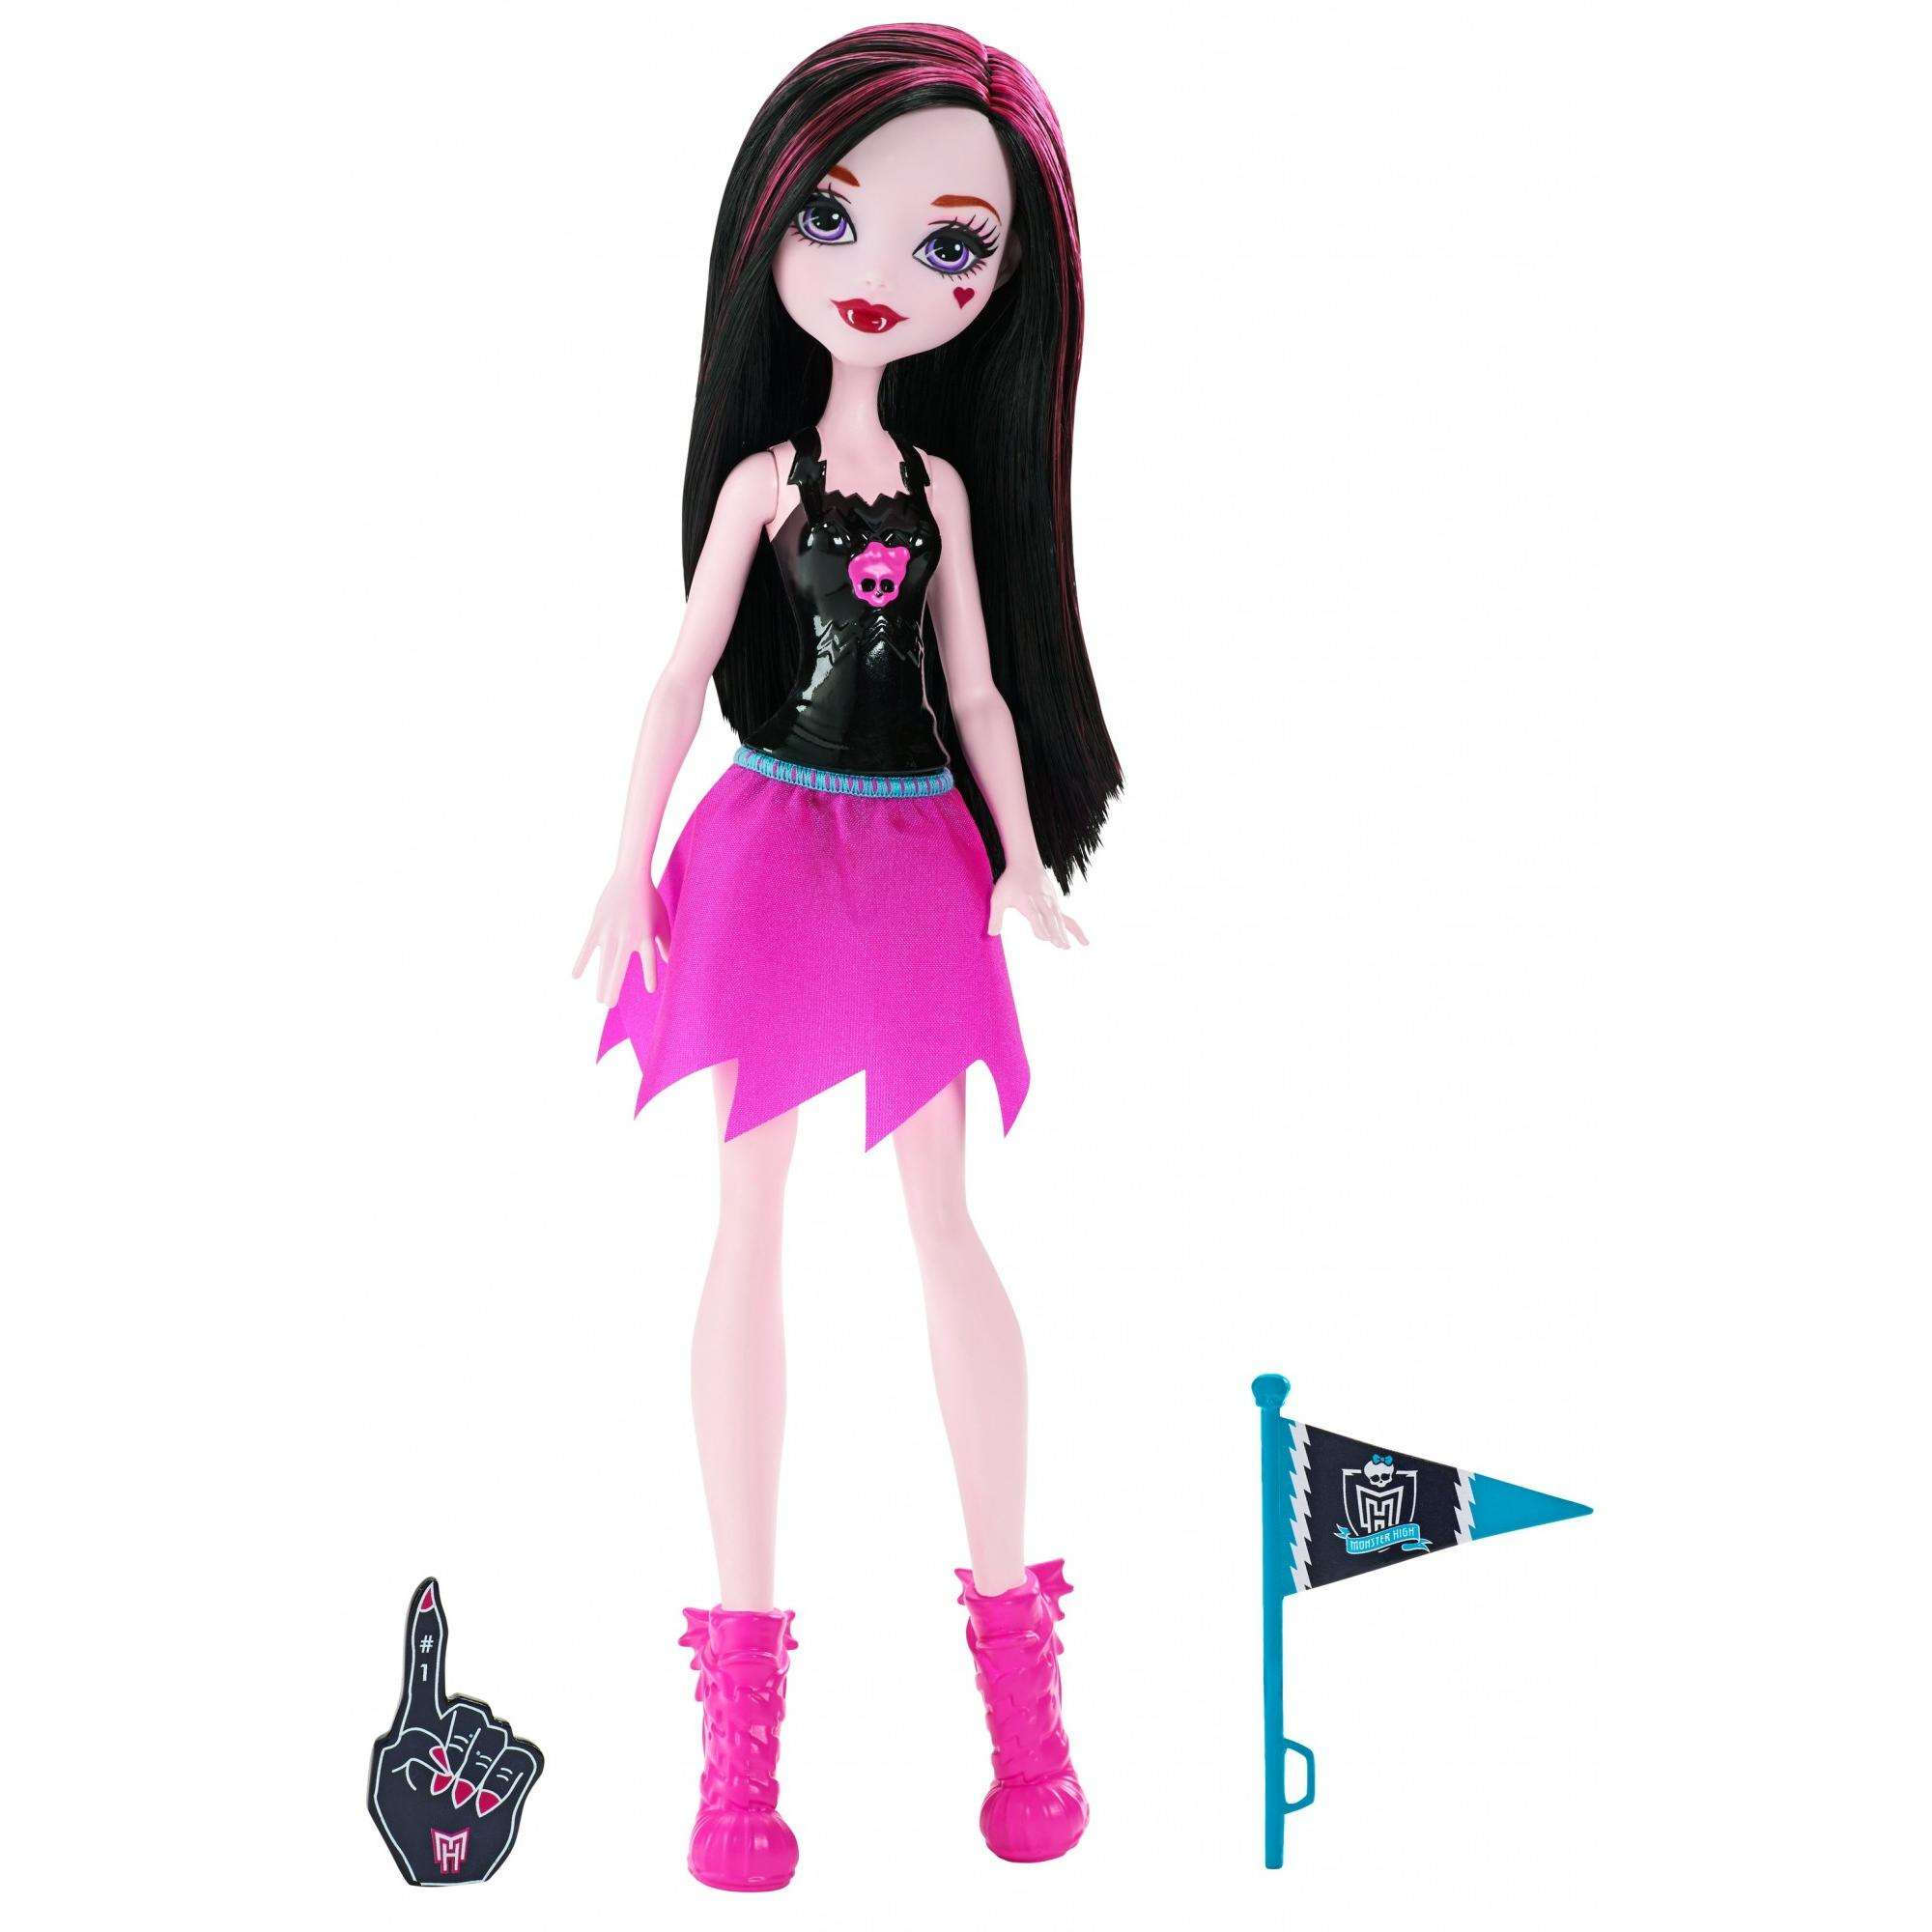 Monster High Cheerleader Draculaura Doll by Mattel